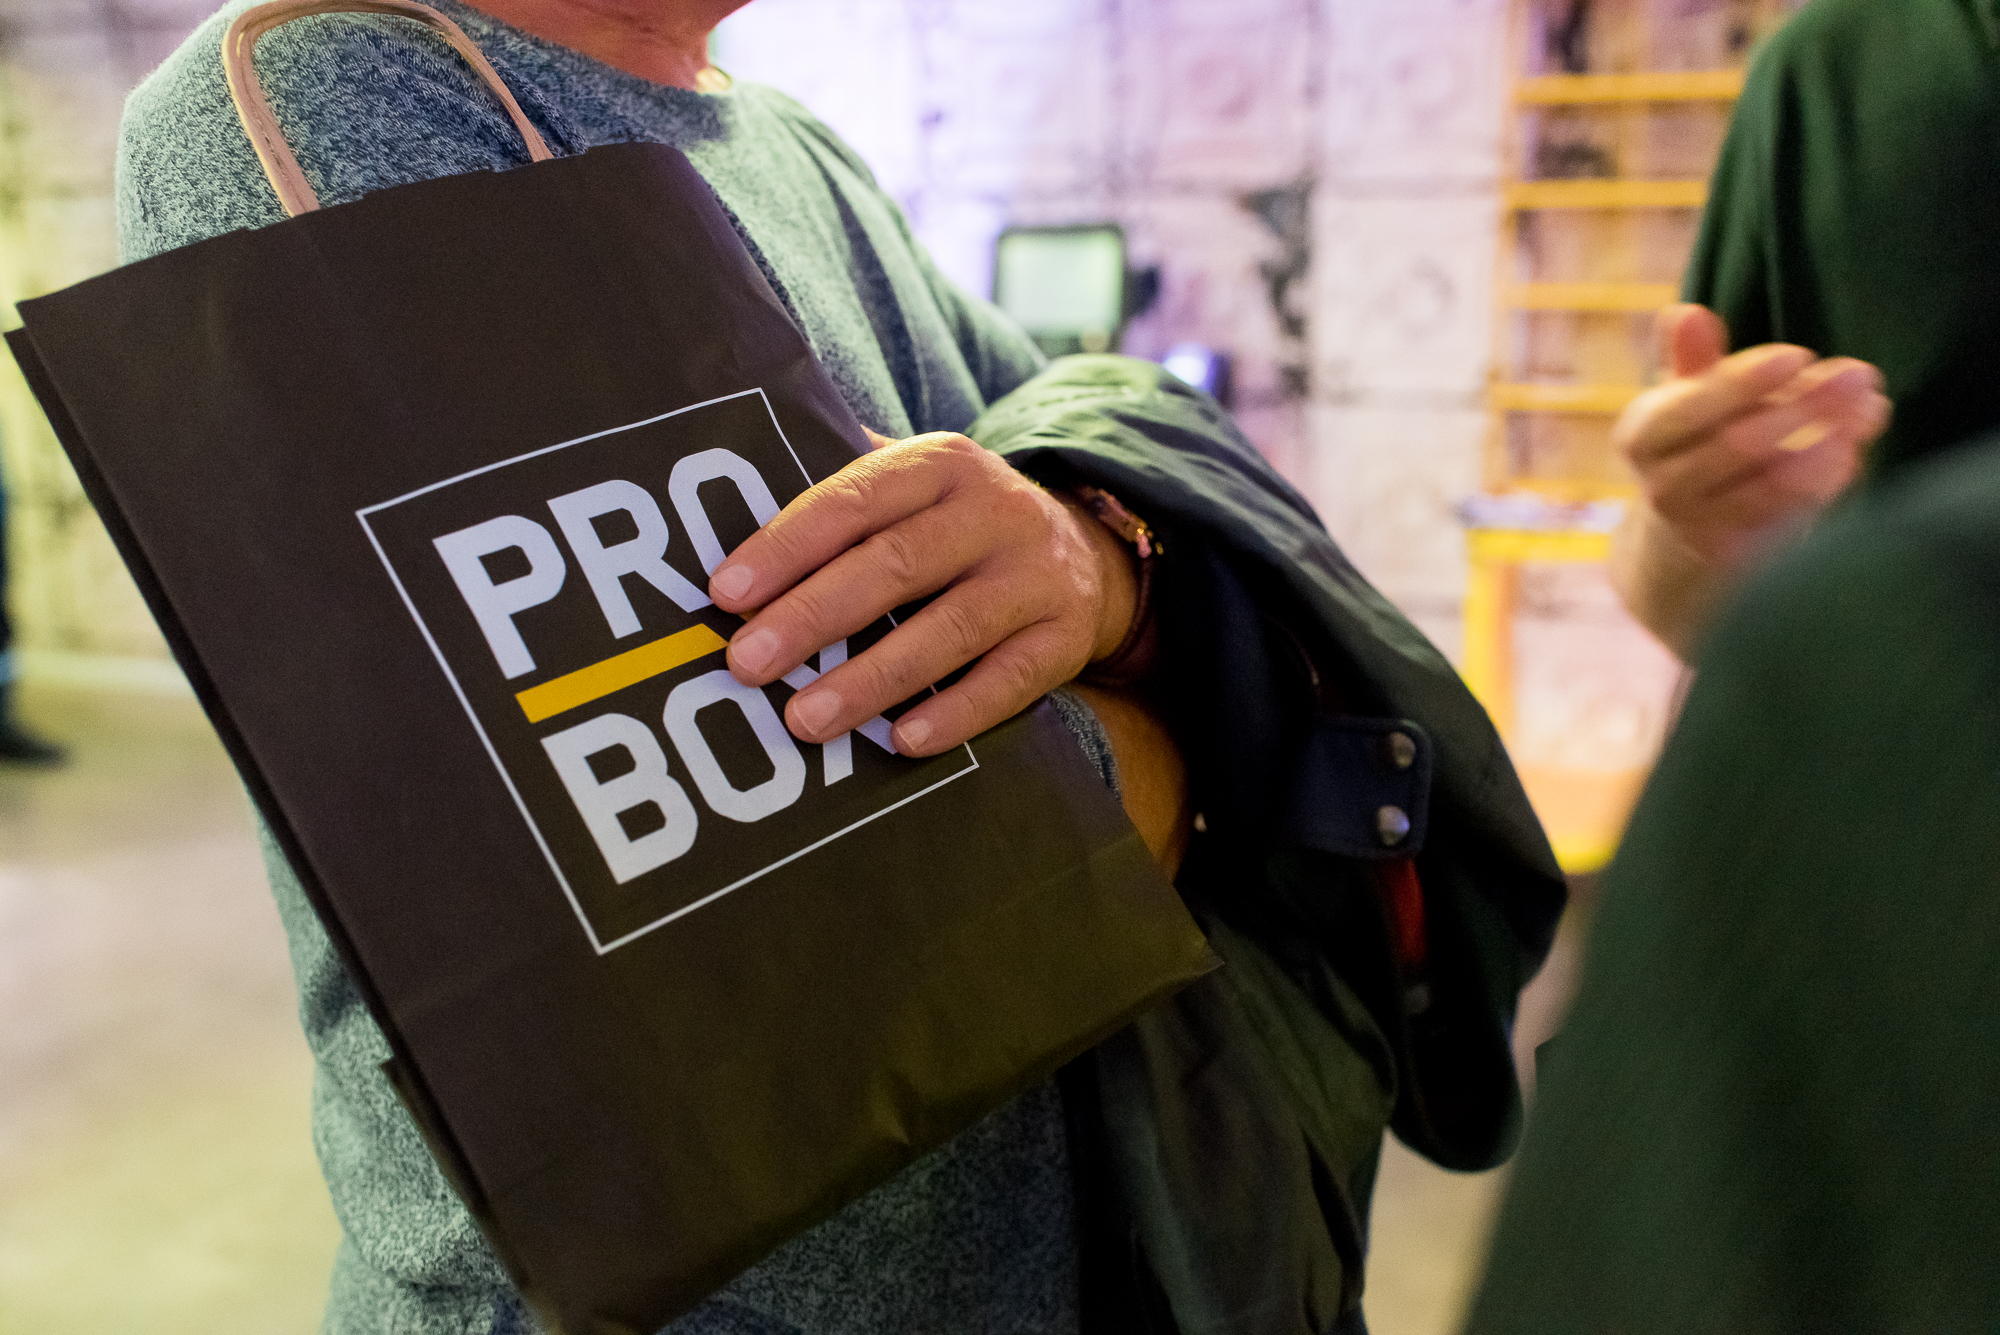 PROBOX fichiers basse def-222